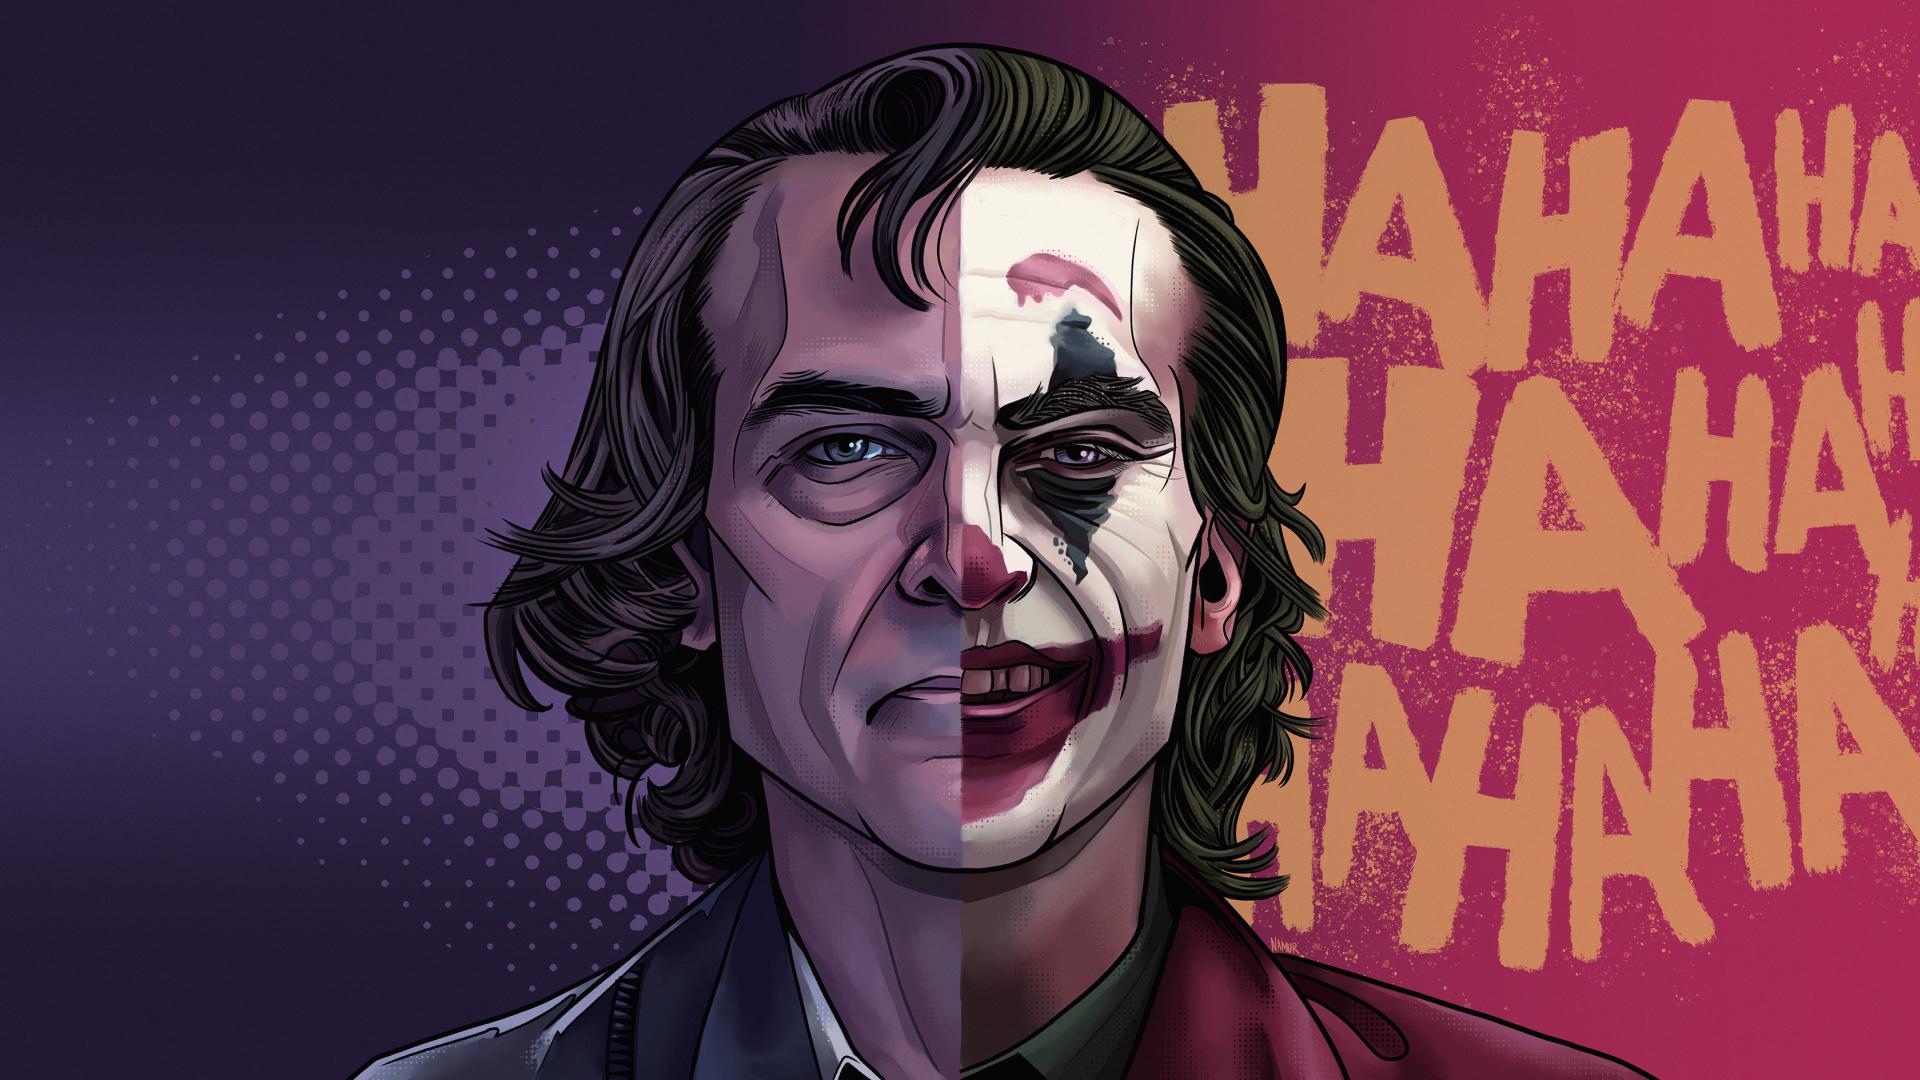 Hd Wallpapers For Pc Joker